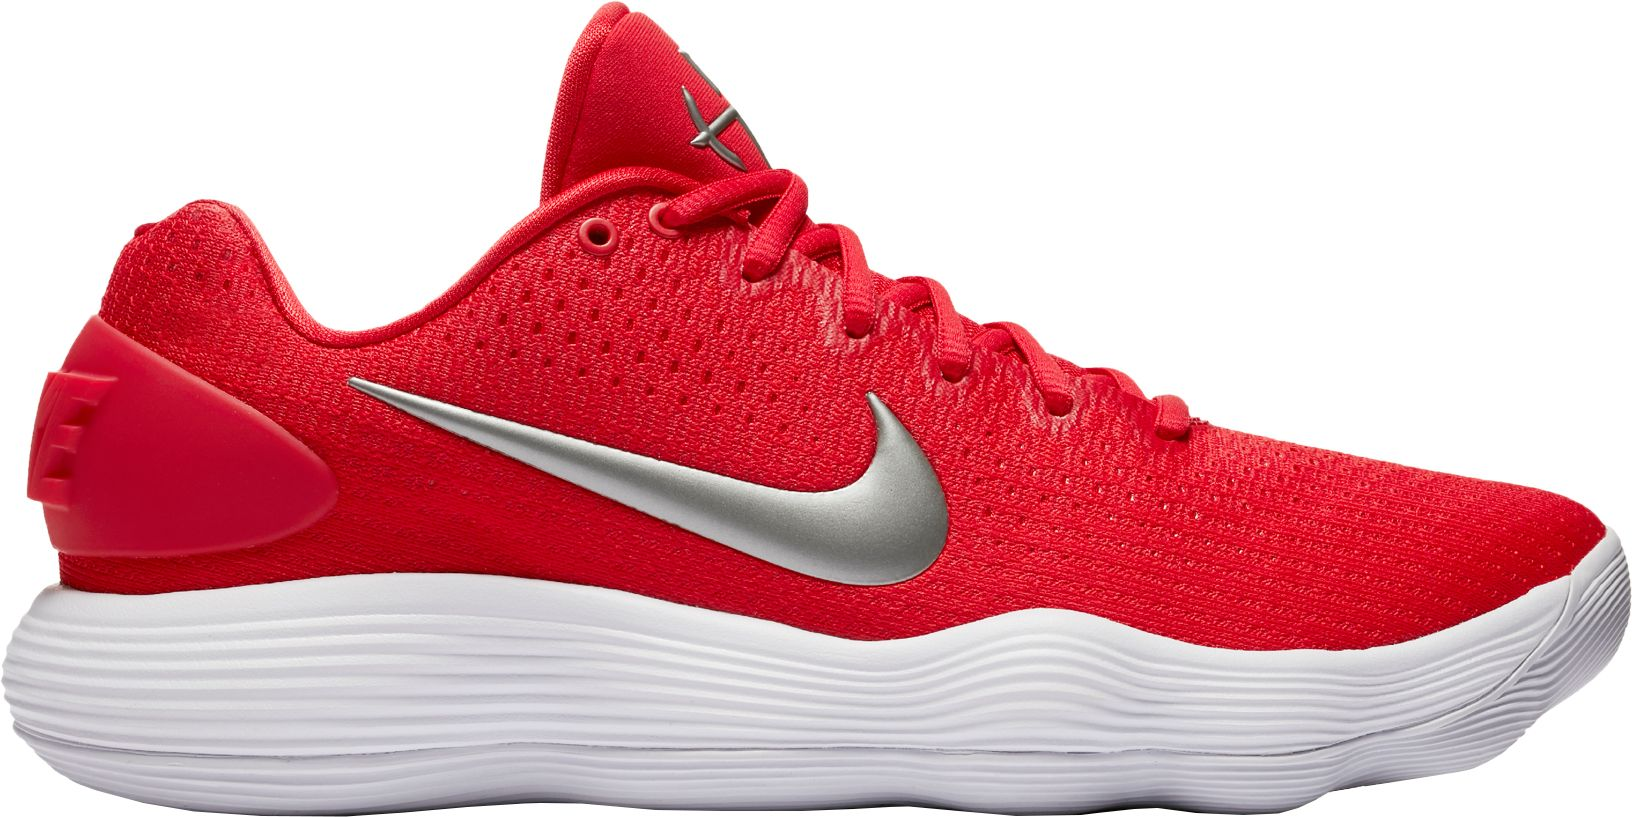 nike basketball shoes 2017. nike basketball shoes 2017 e